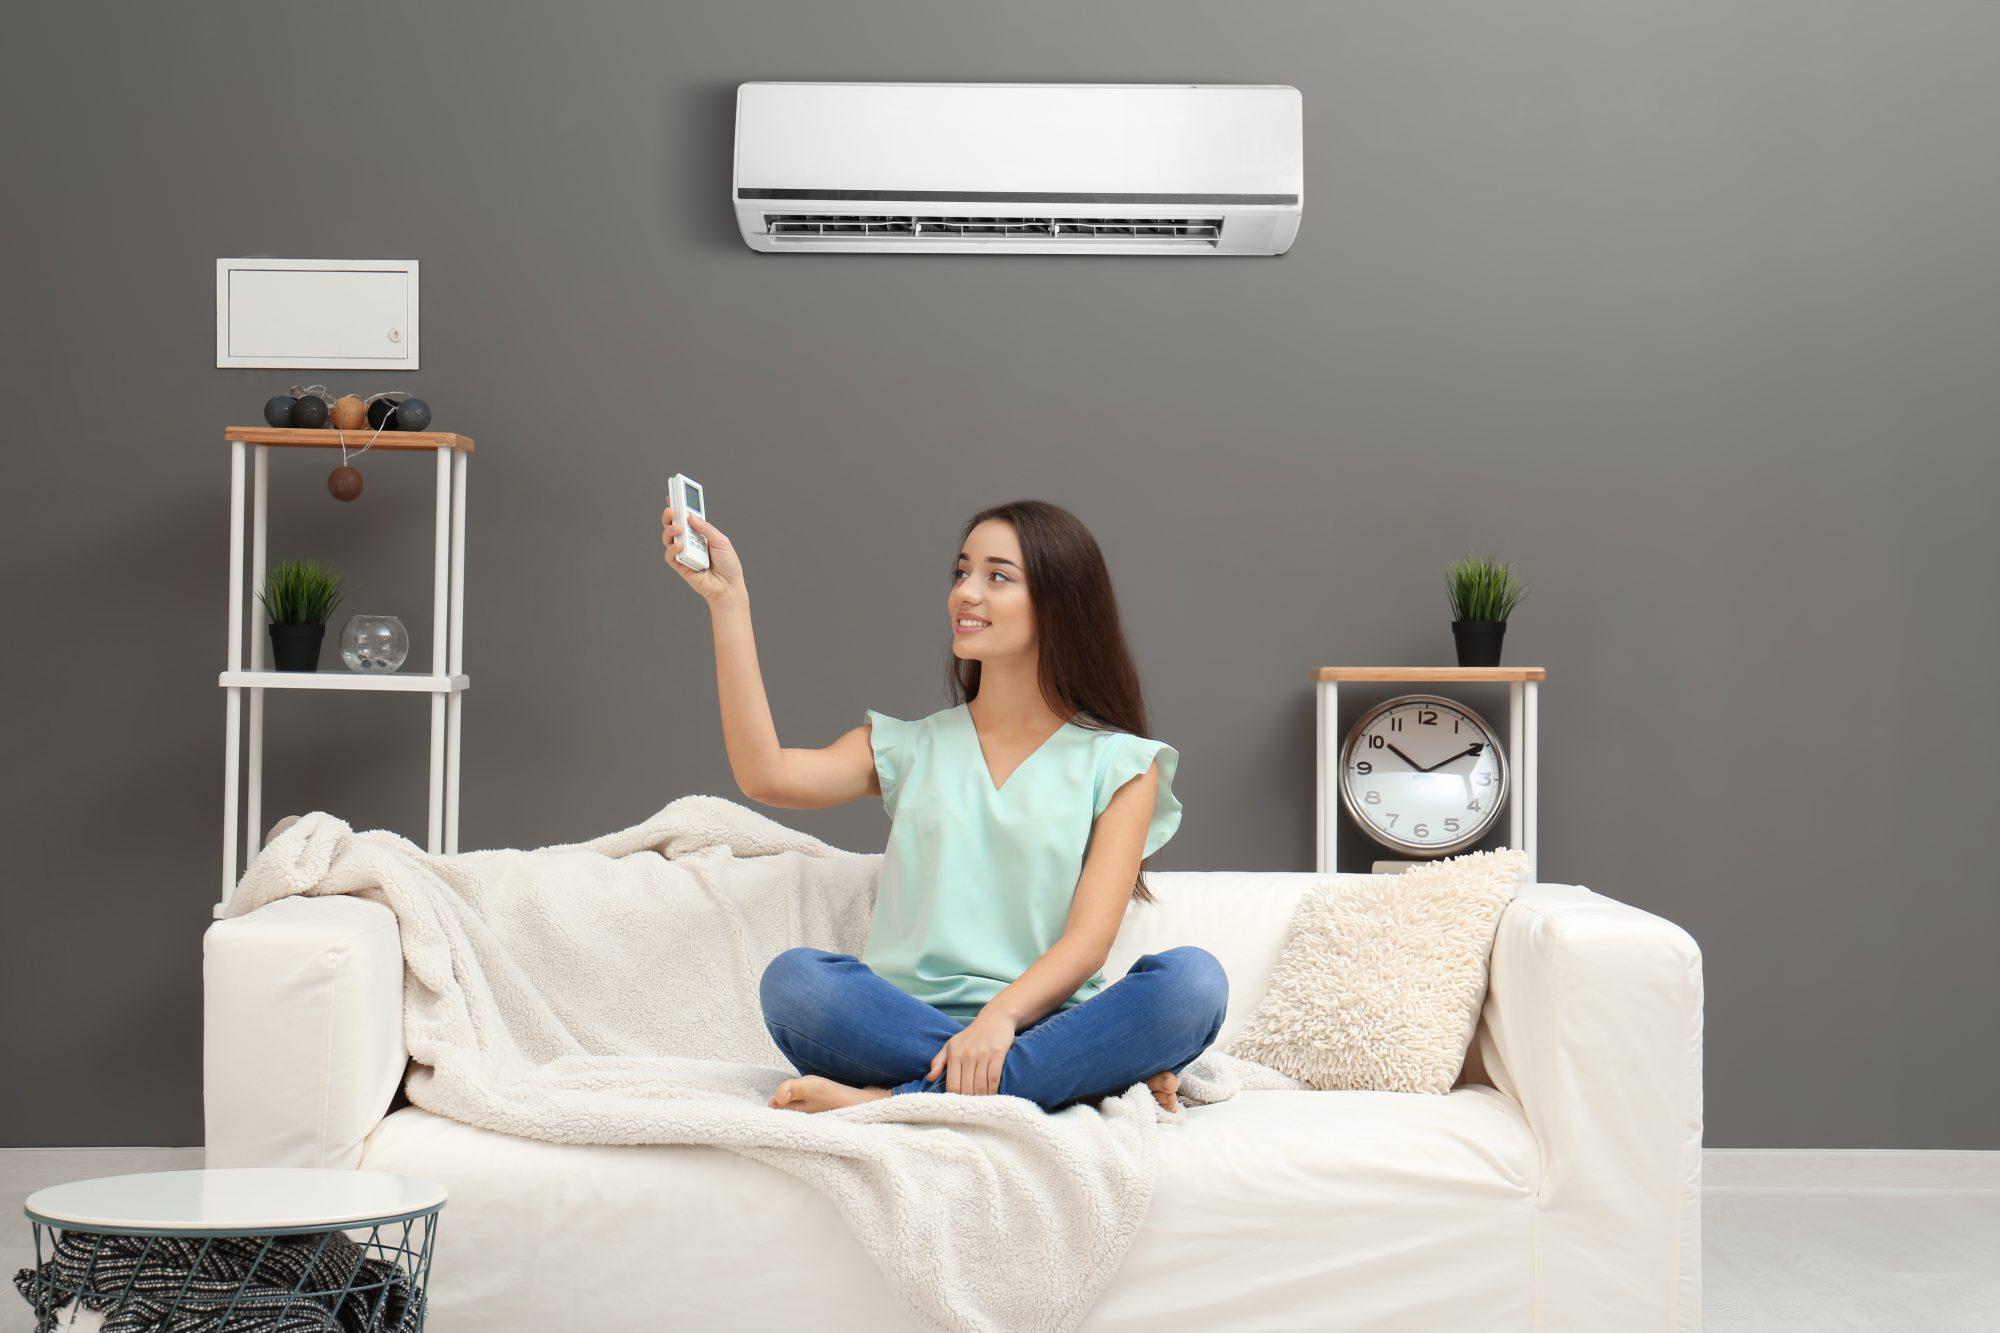 Saiba como calcular os BTUs do ar-condicionado